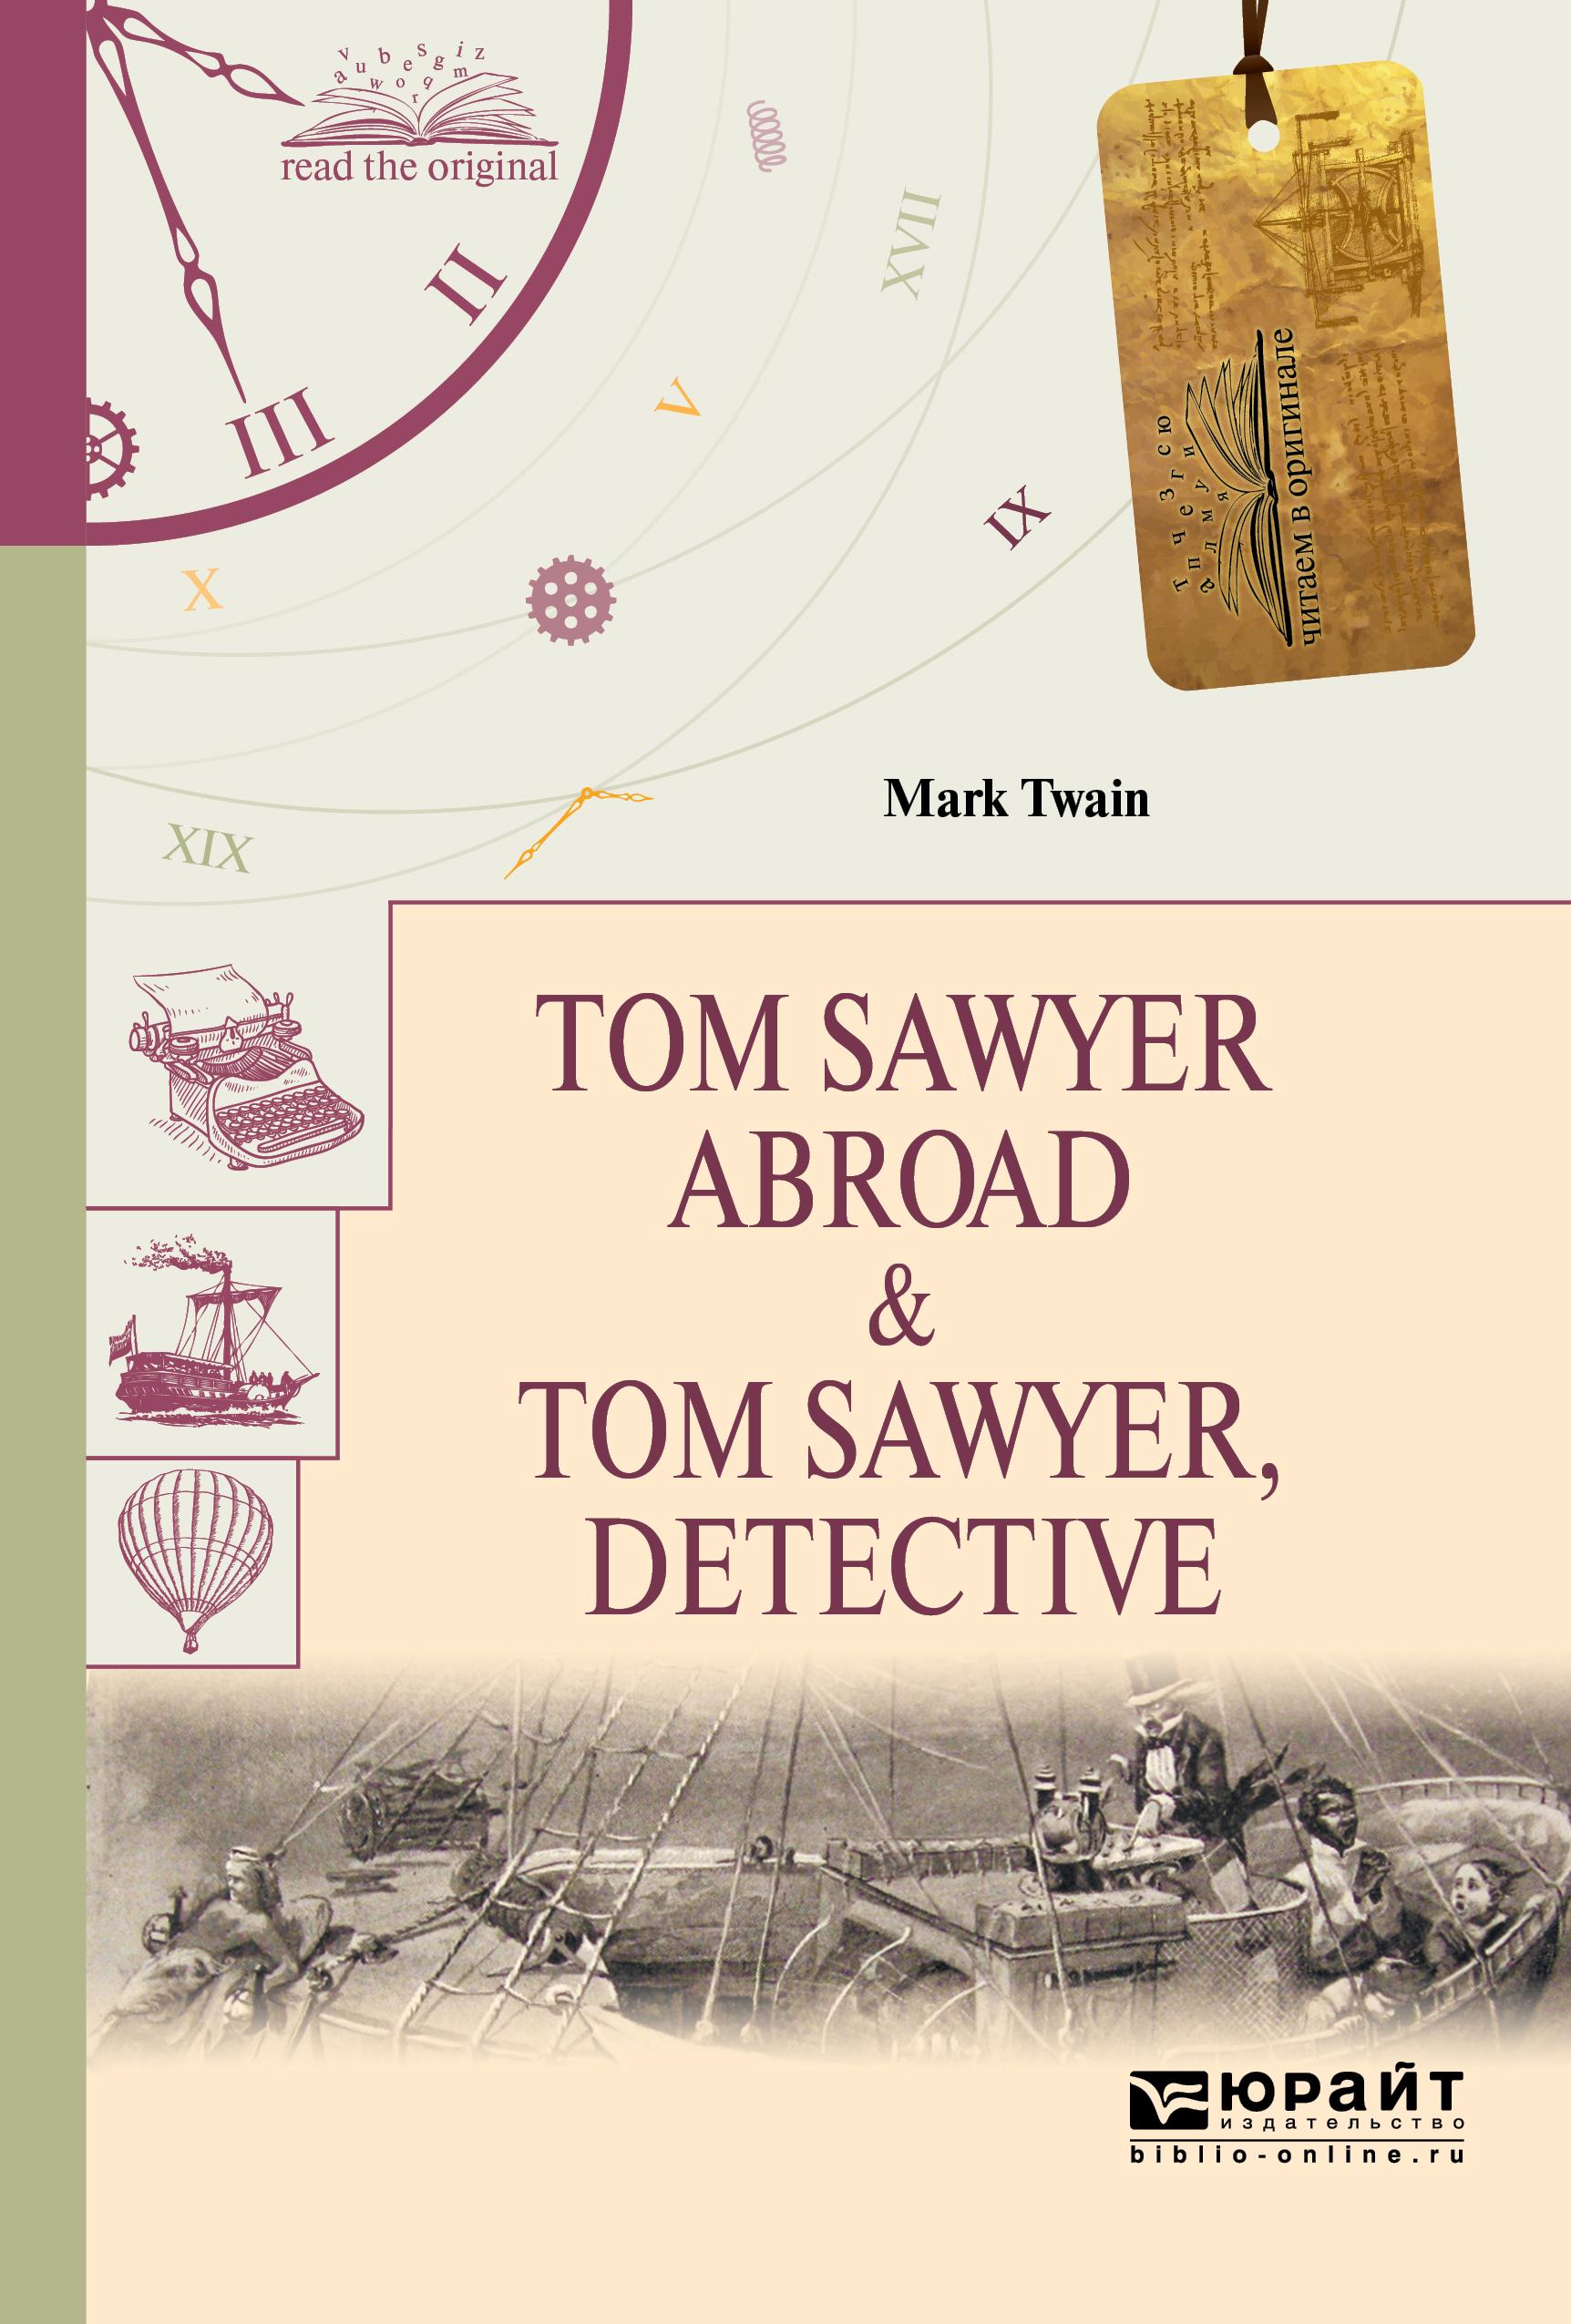 Твен Марк Tom Sawyer Abroad & Tom Sawyer, Detective / Том Сойер за границей. Том Сойер - сыщик твен м том сойер приключения тома сойера том сойер за границей том сойер сыщик